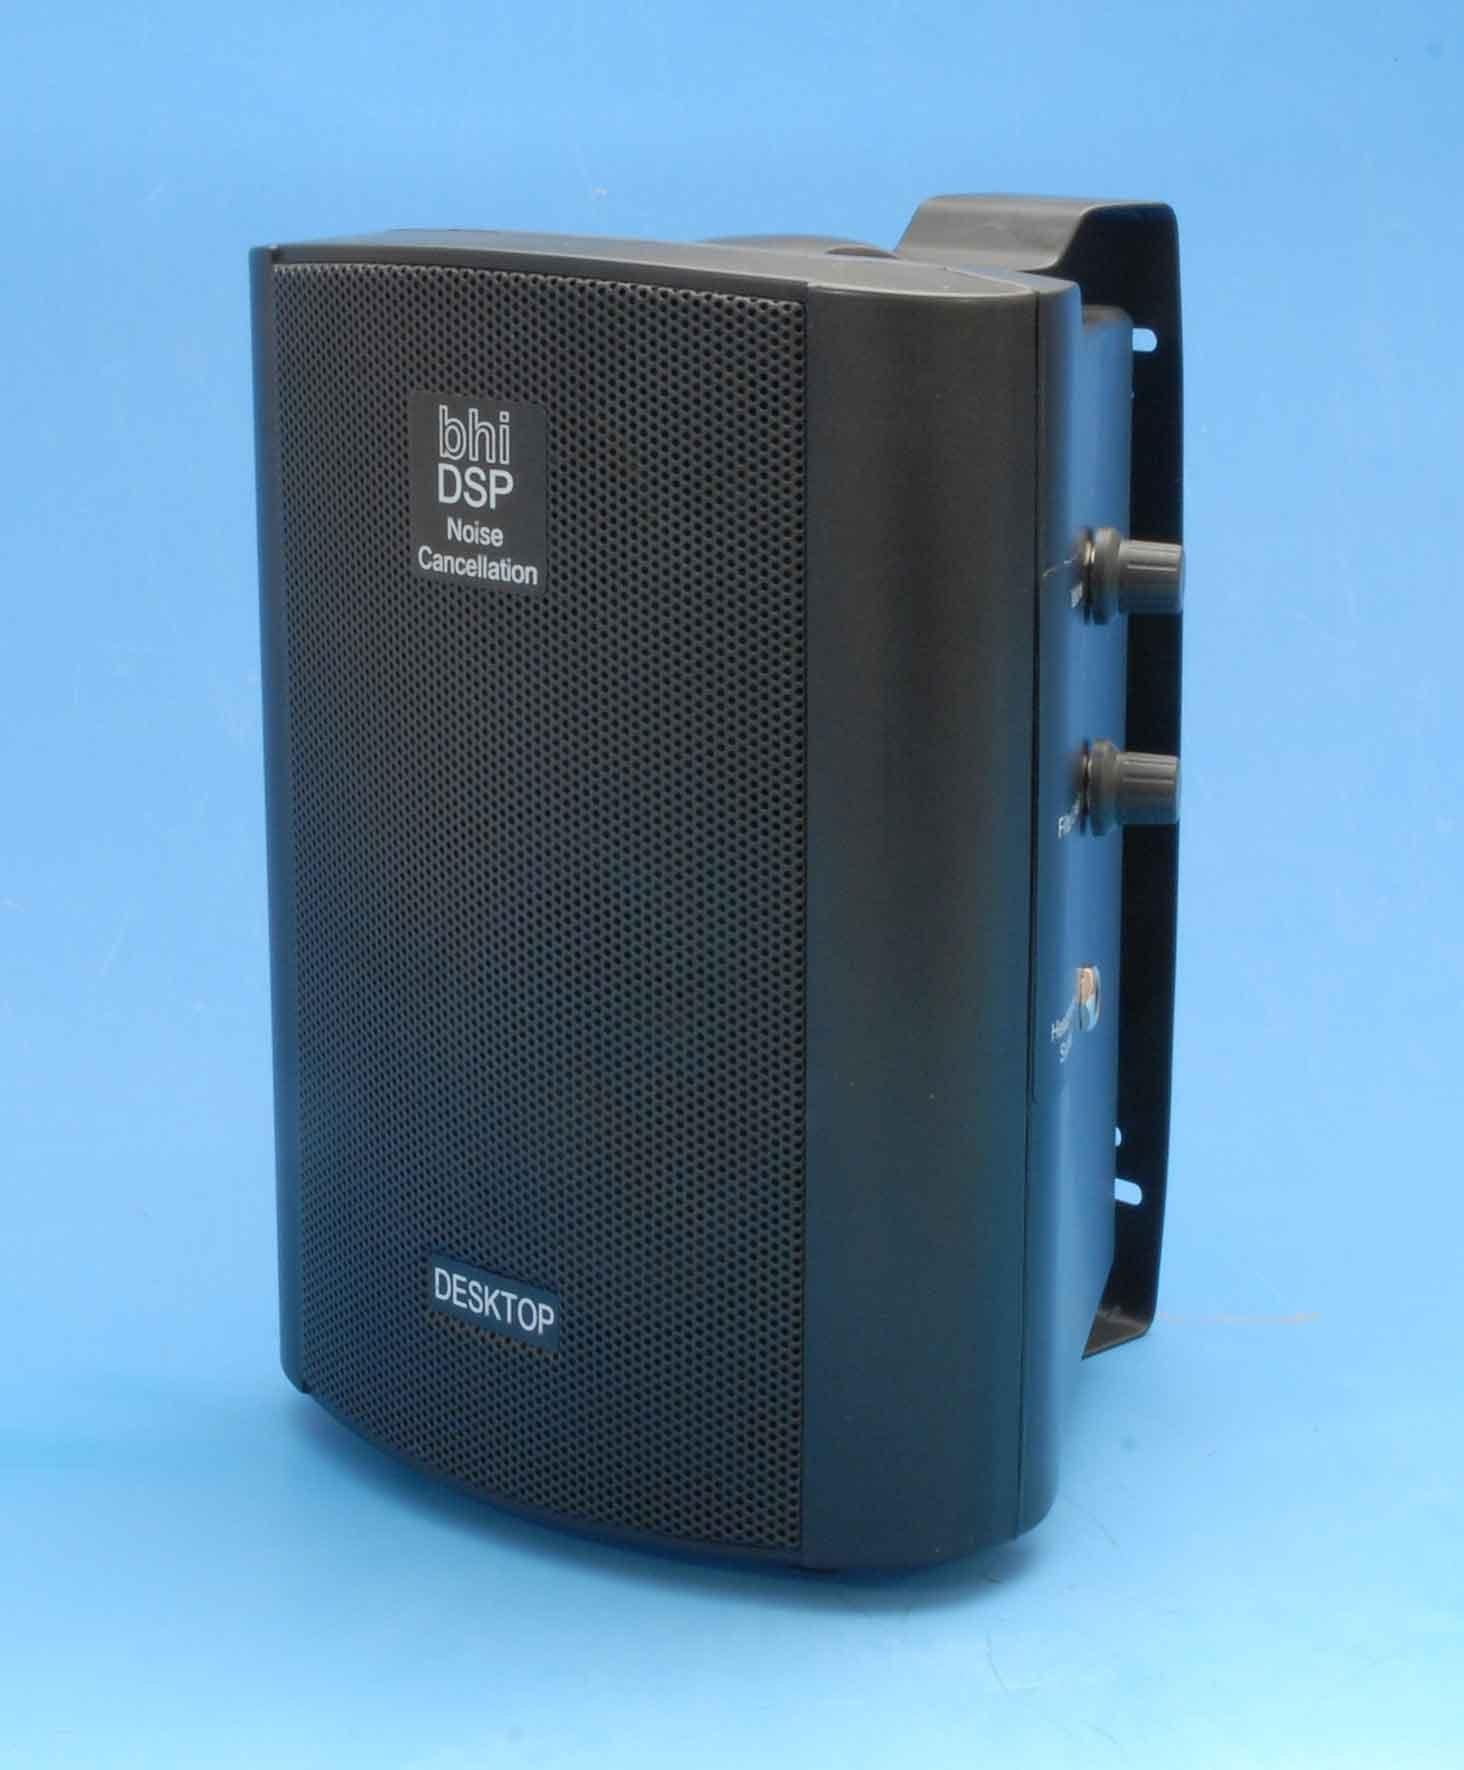 DESKTOP 10 watt DSP noise cancelling base station speaker ...